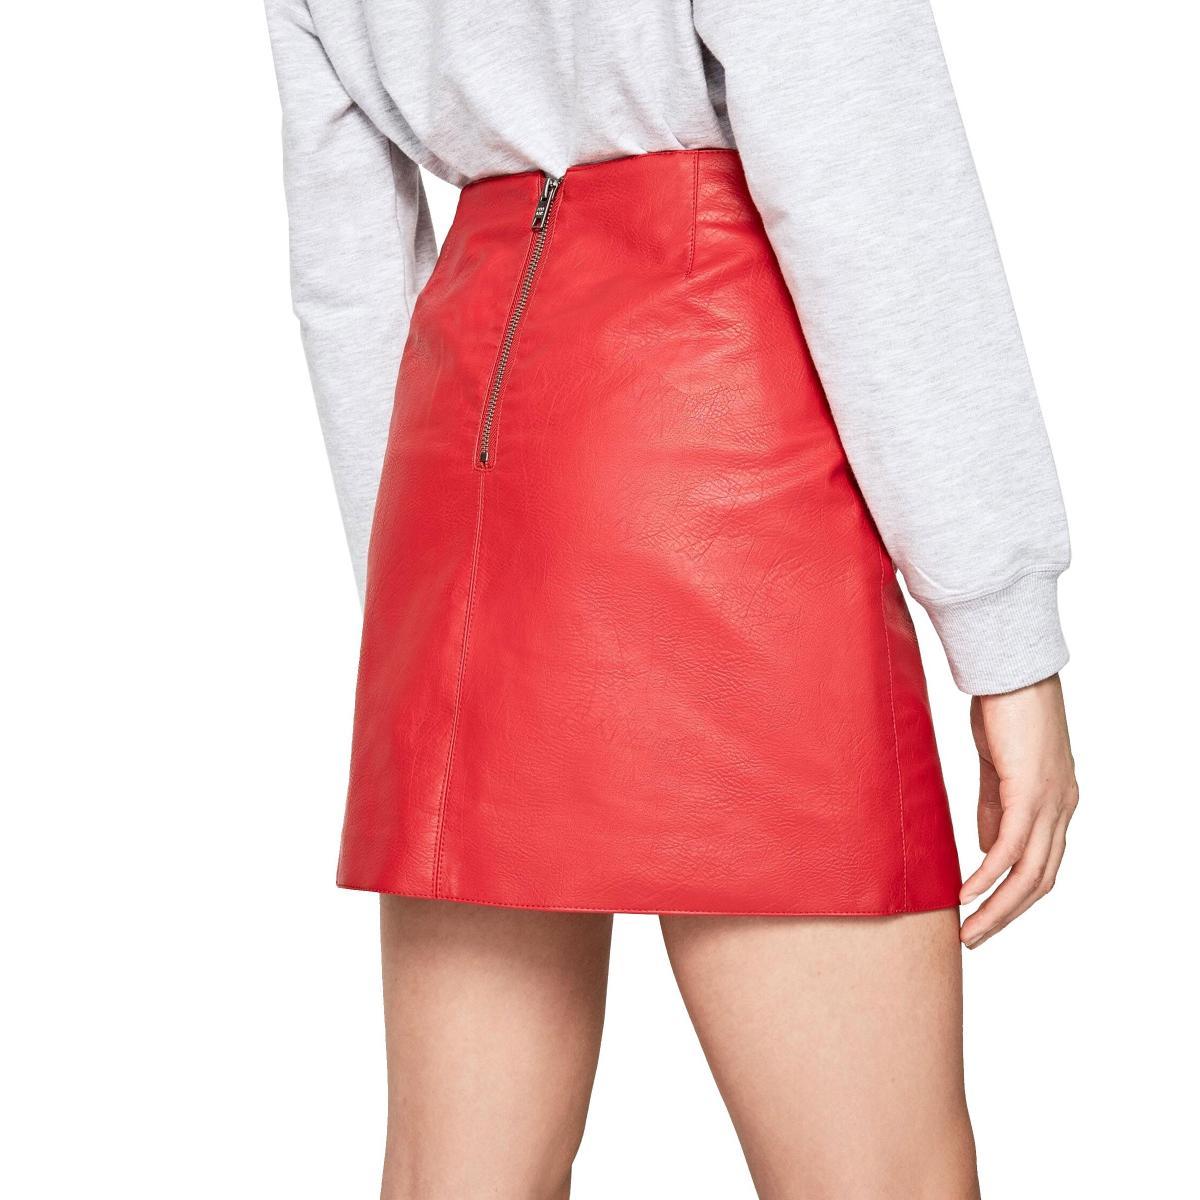 Minigonna Pepe Jeans Henar in ecopelle da donna rif. PL900813 HENAR